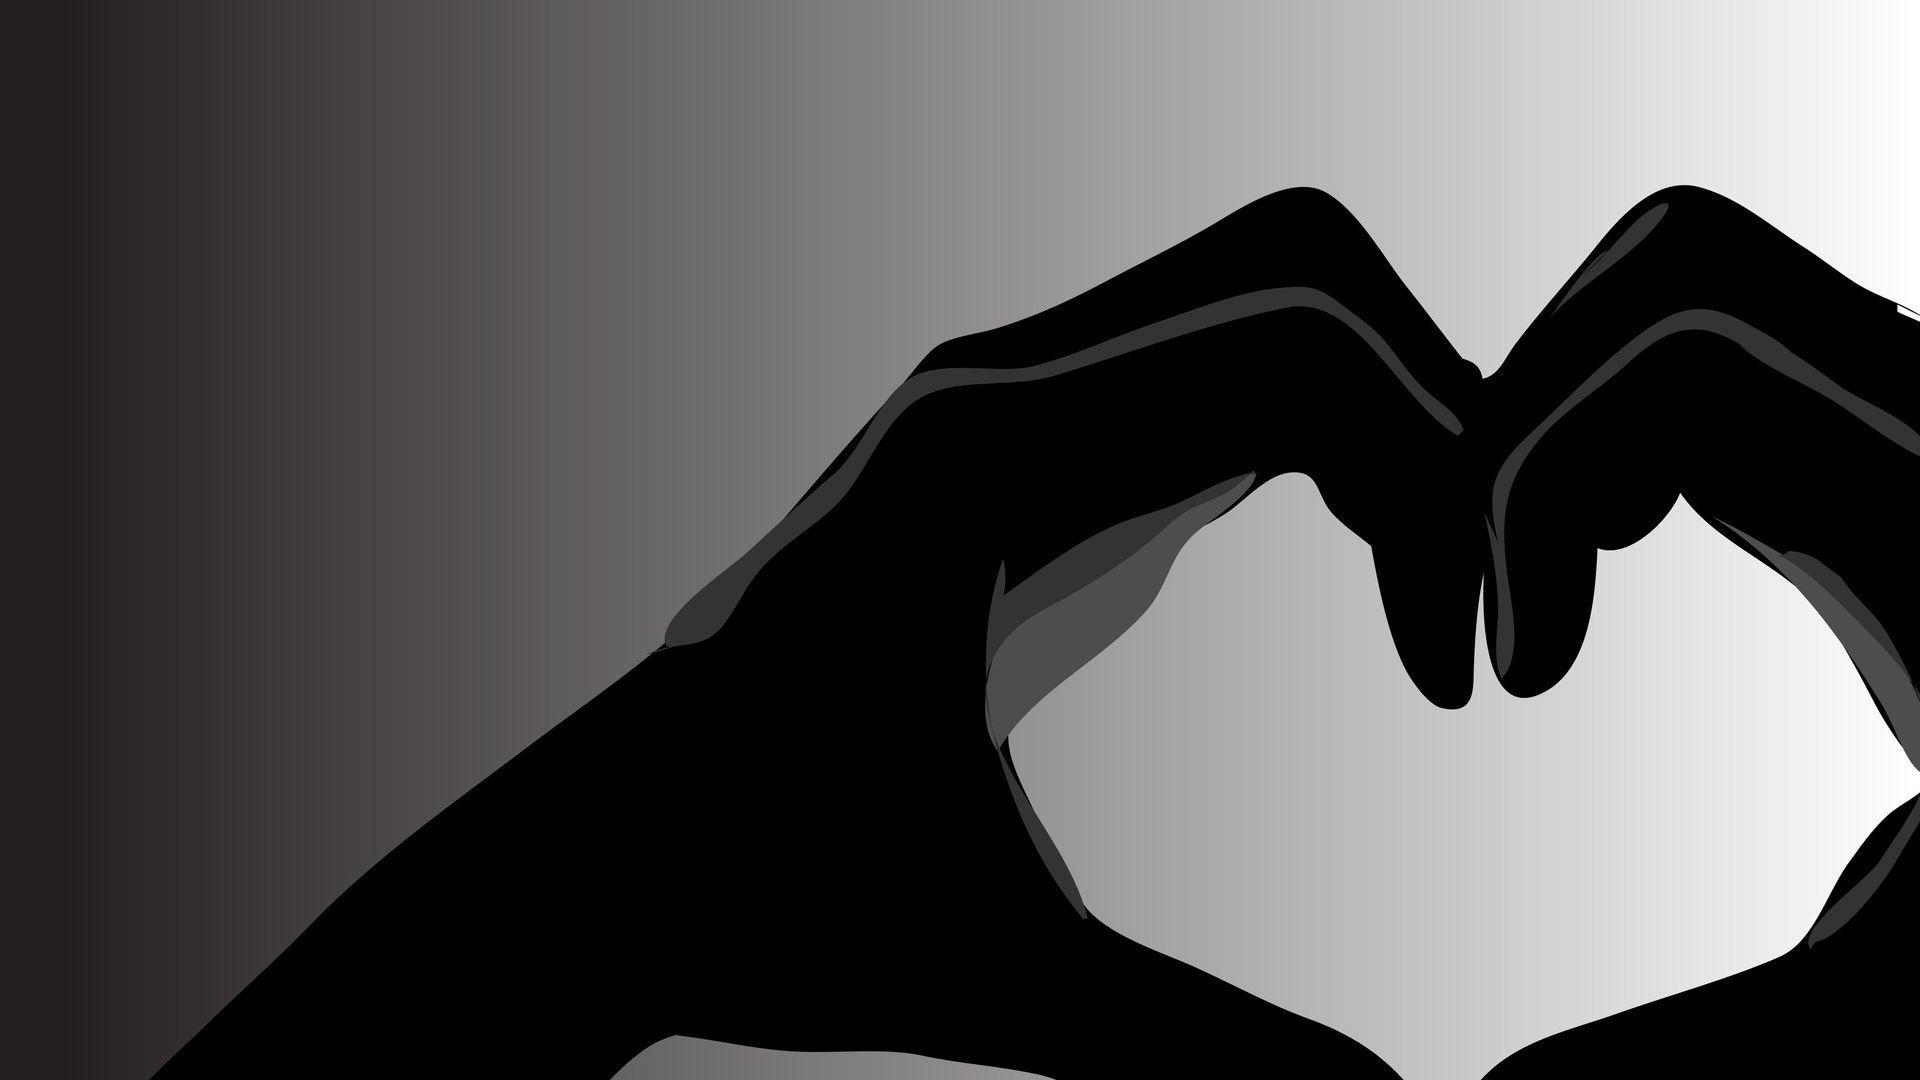 Black and white love wallpaper 2677 6765 wallpaper spotimg